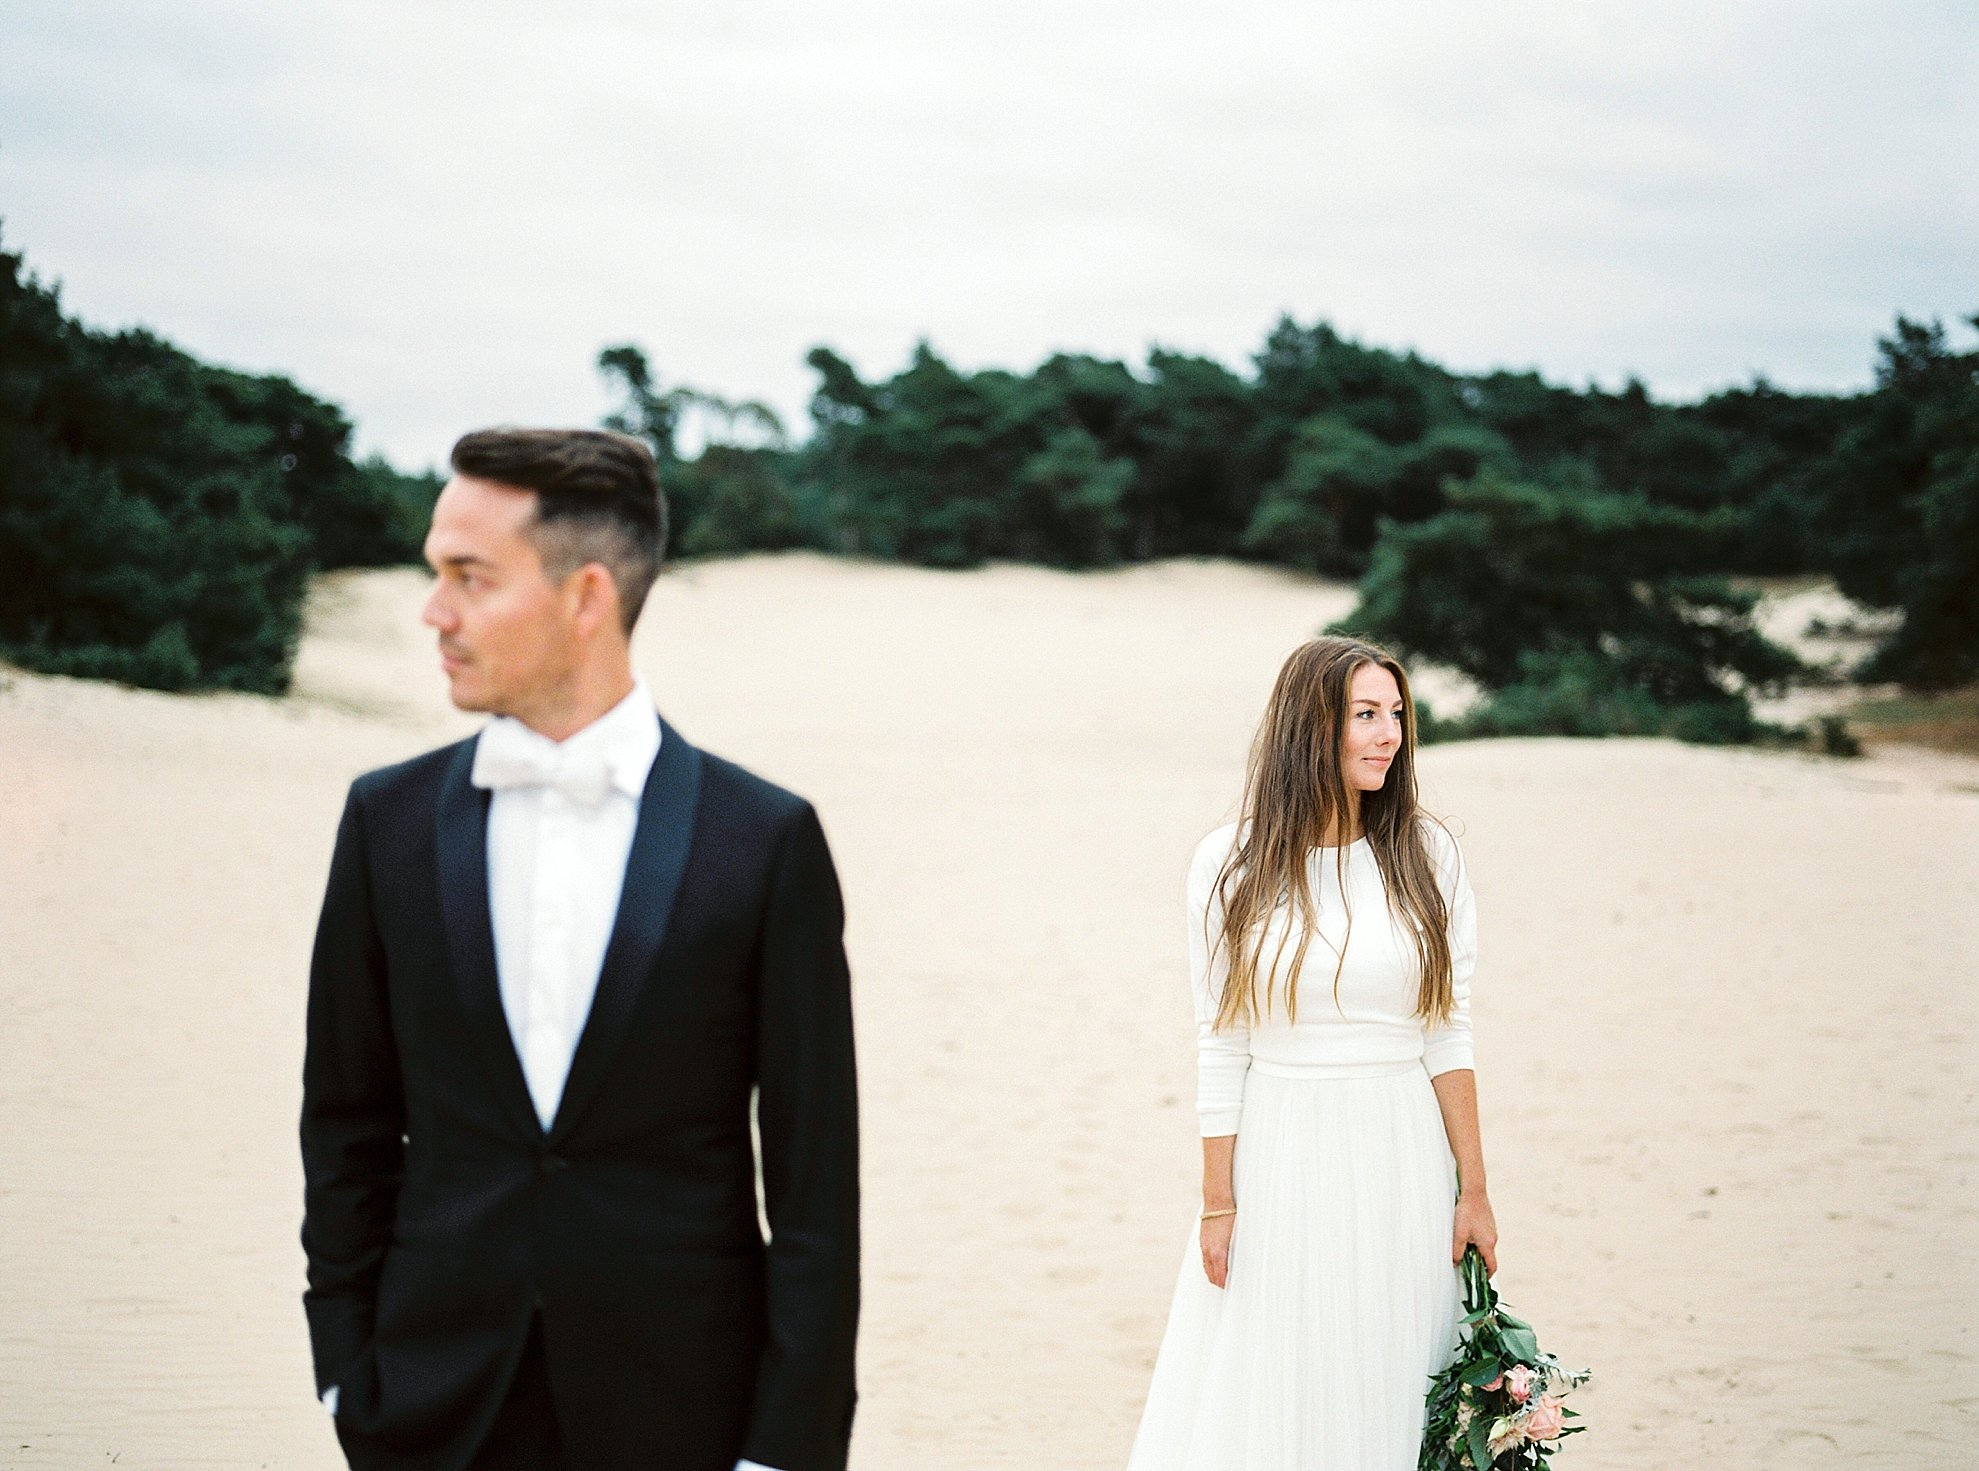 Amanda-Drost-photography-fine-art-nederland-couple-shoot-editorial_0005.jpg